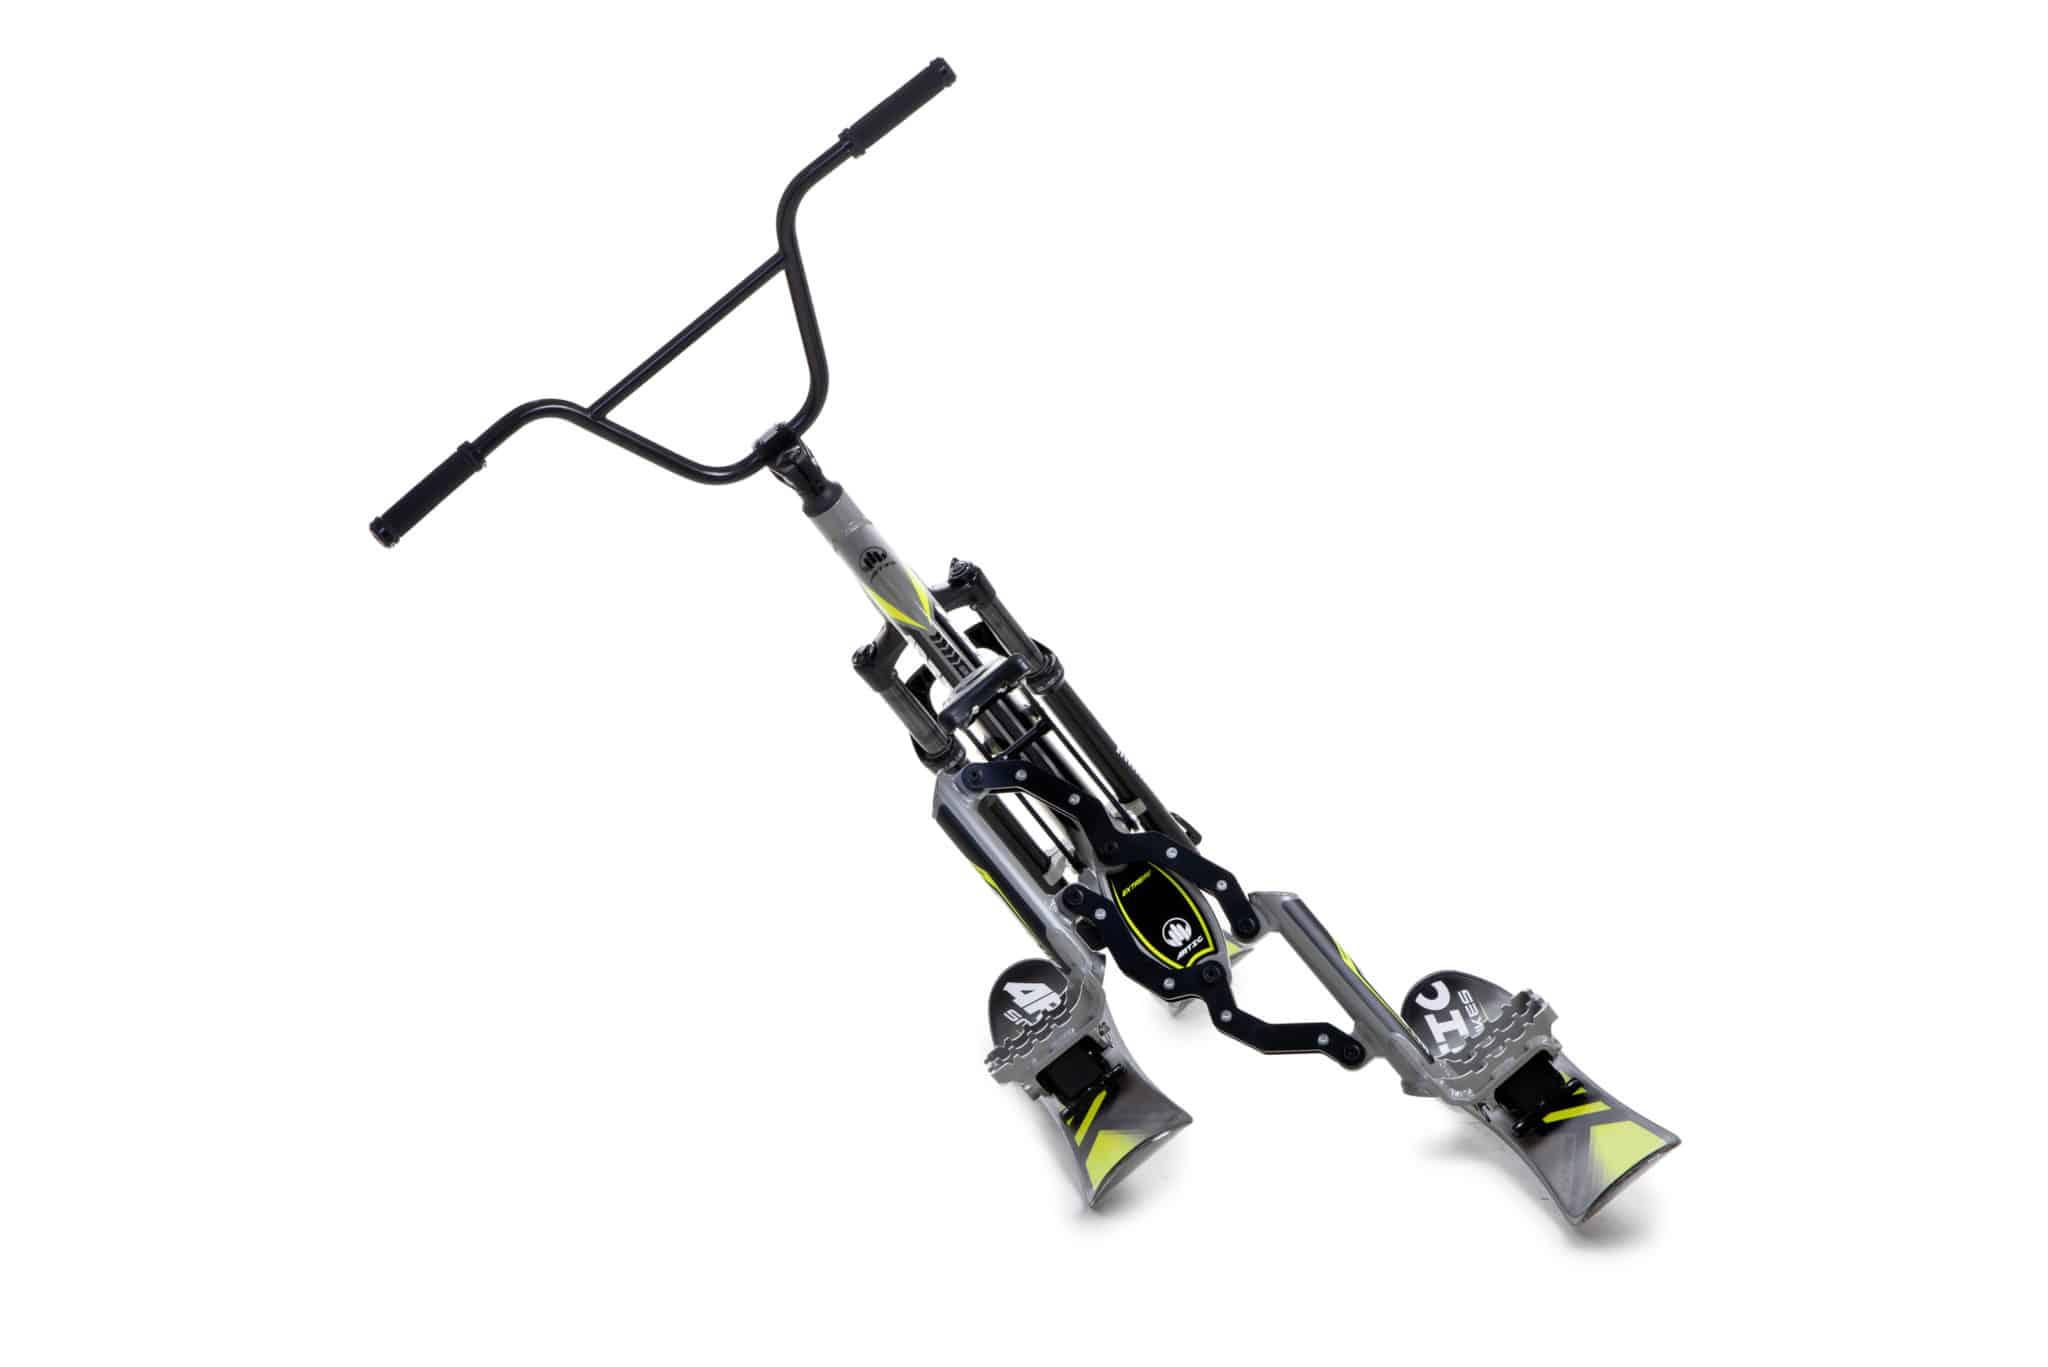 Artic-snowbike-rental-esports-santmoritz-arinsal-vallnord-pal (10)